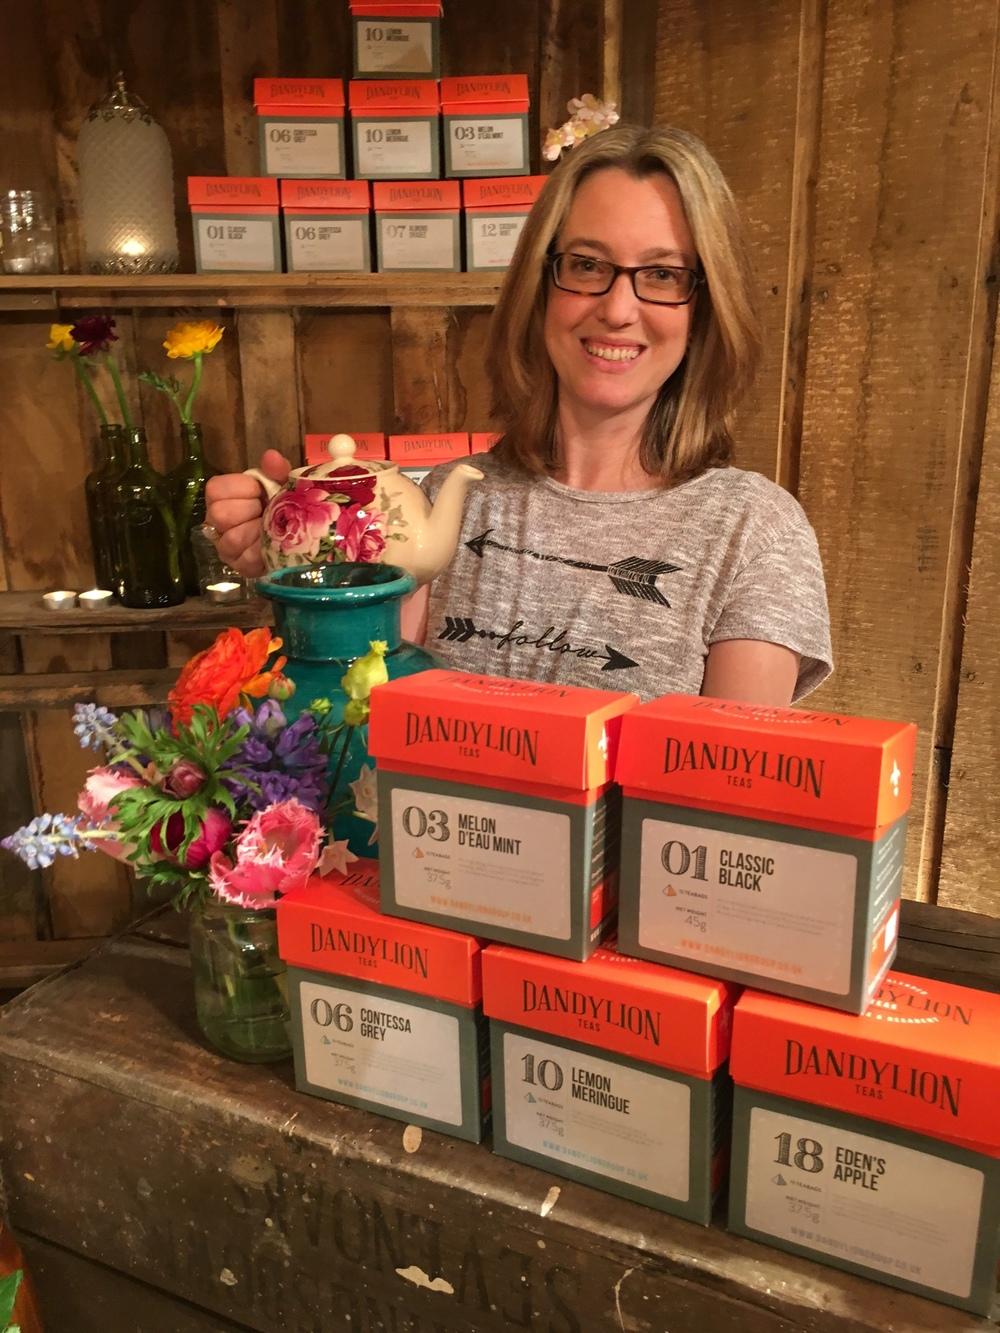 Francesca Booth Dandylion Teas artisan tea blended in Kent